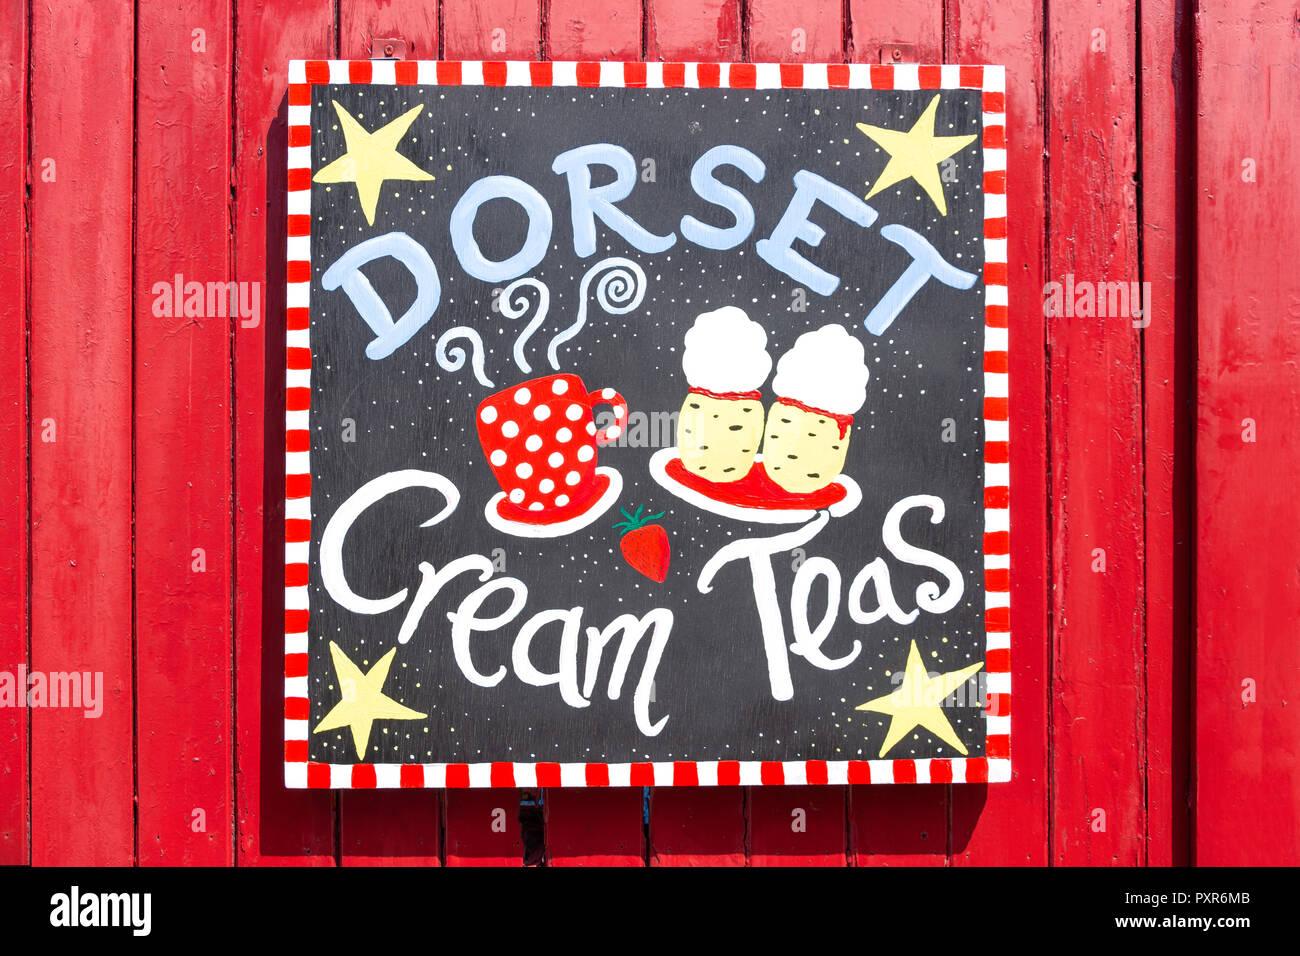 Dorset Cream Teas tearoom sign, Corfe Castle, Isle of Purbeck, Dorset, England, United Kingdom - Stock Image